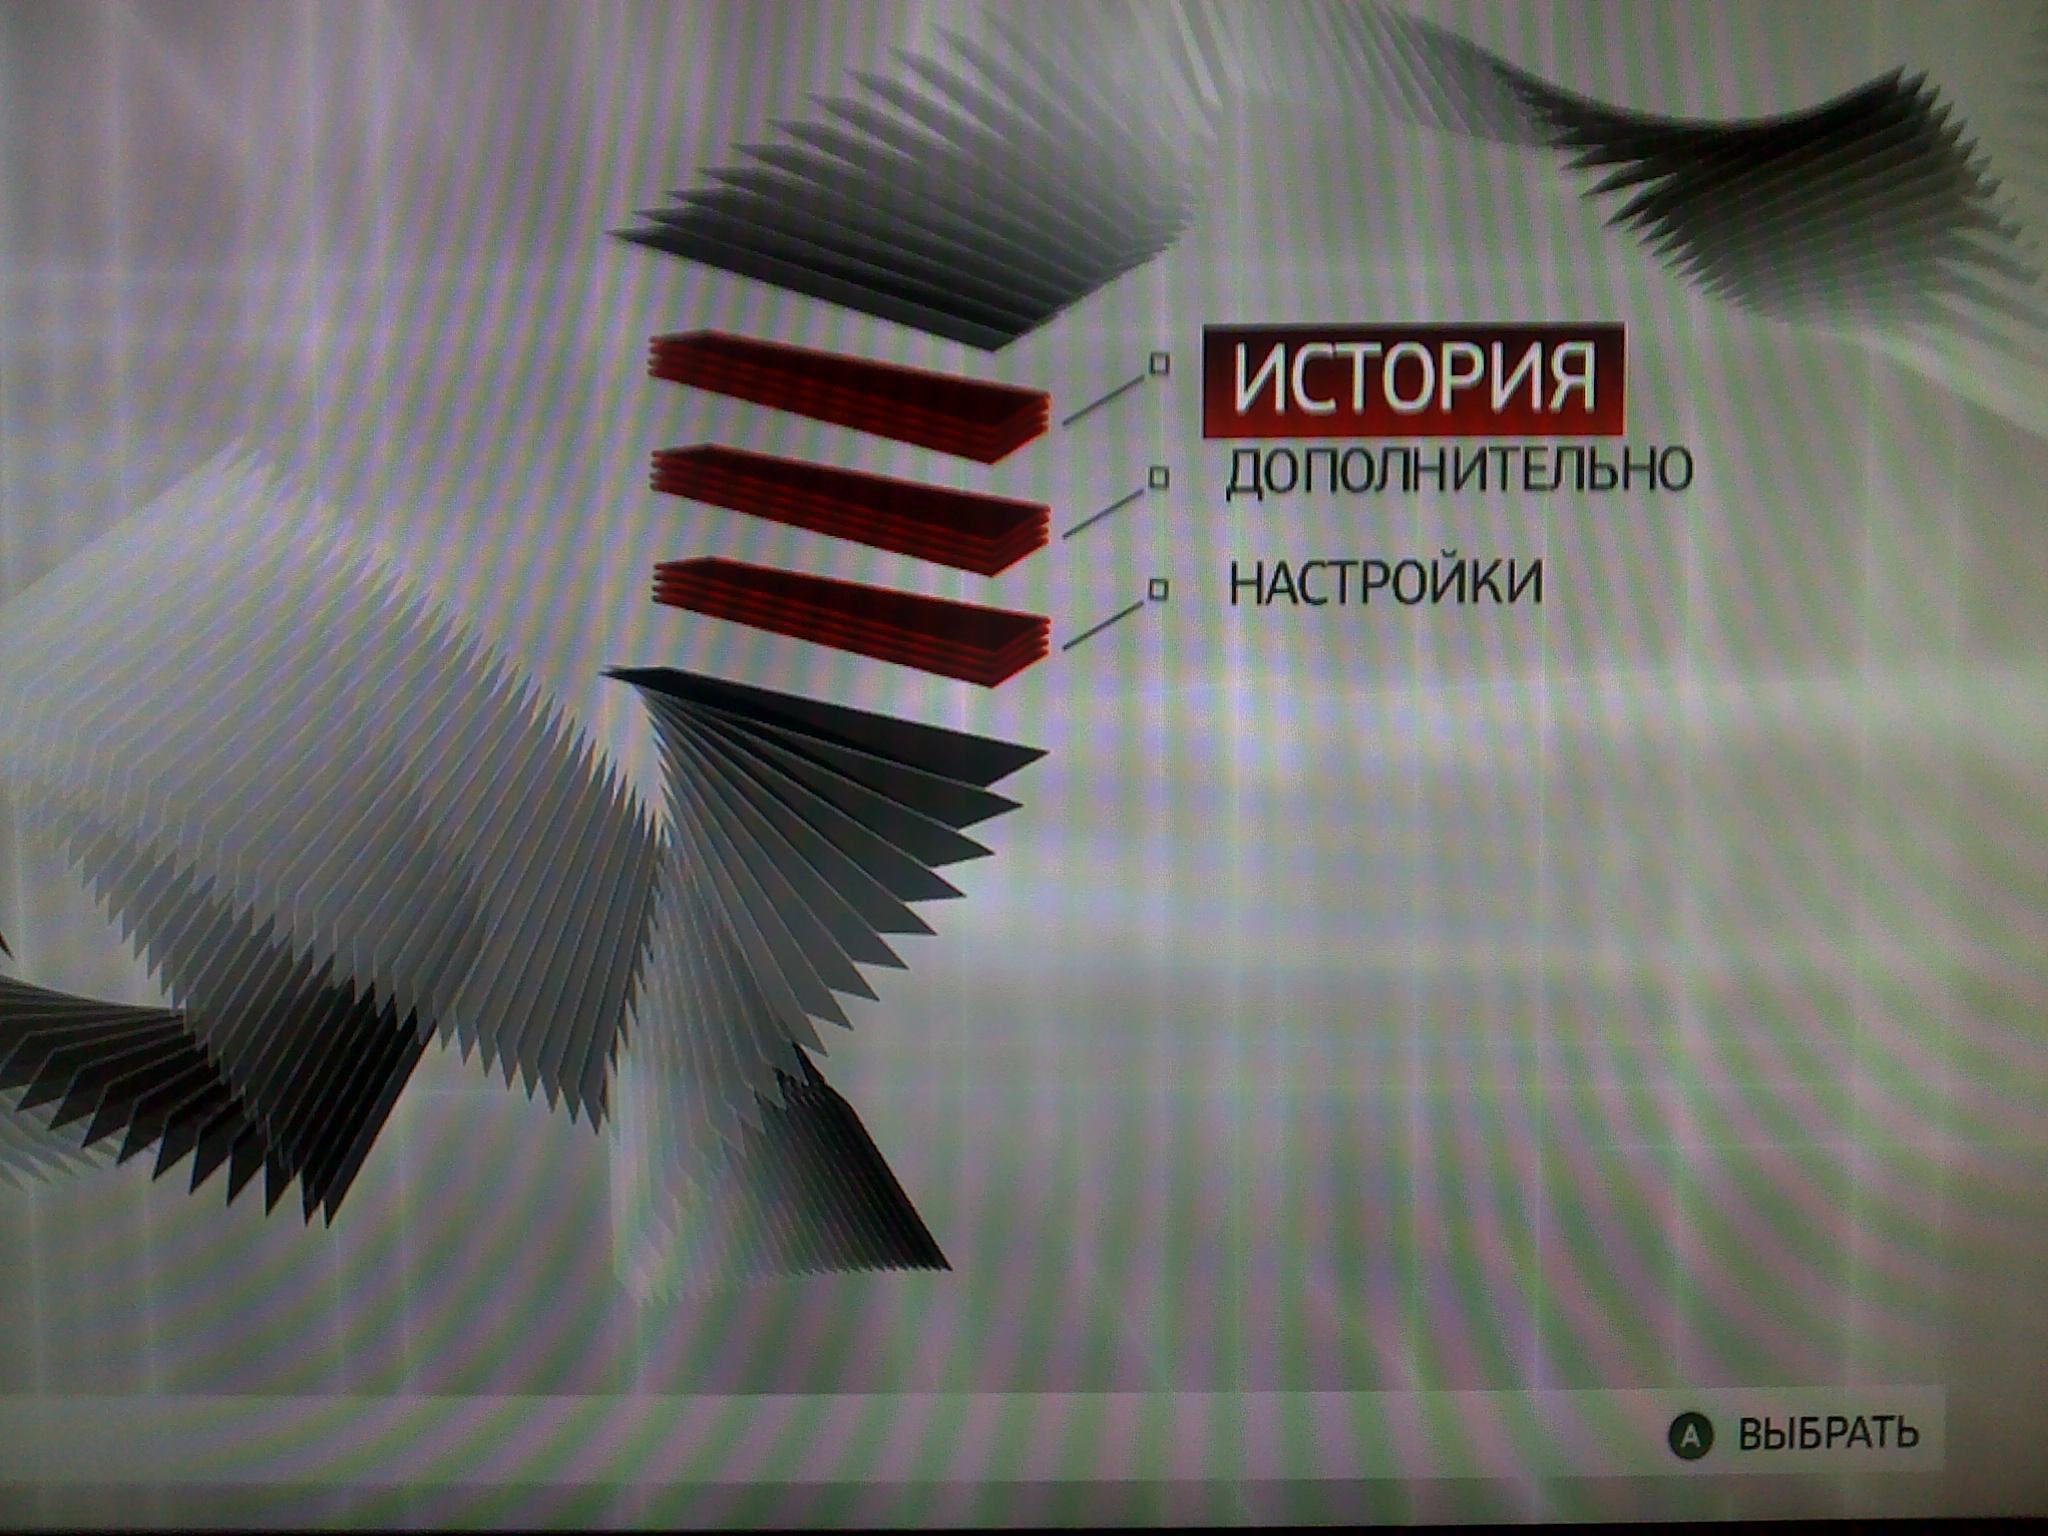 http://imageban.ru/out/2009/12/06/abcd54e4a7d27606b6232b500671d2e5.jpg